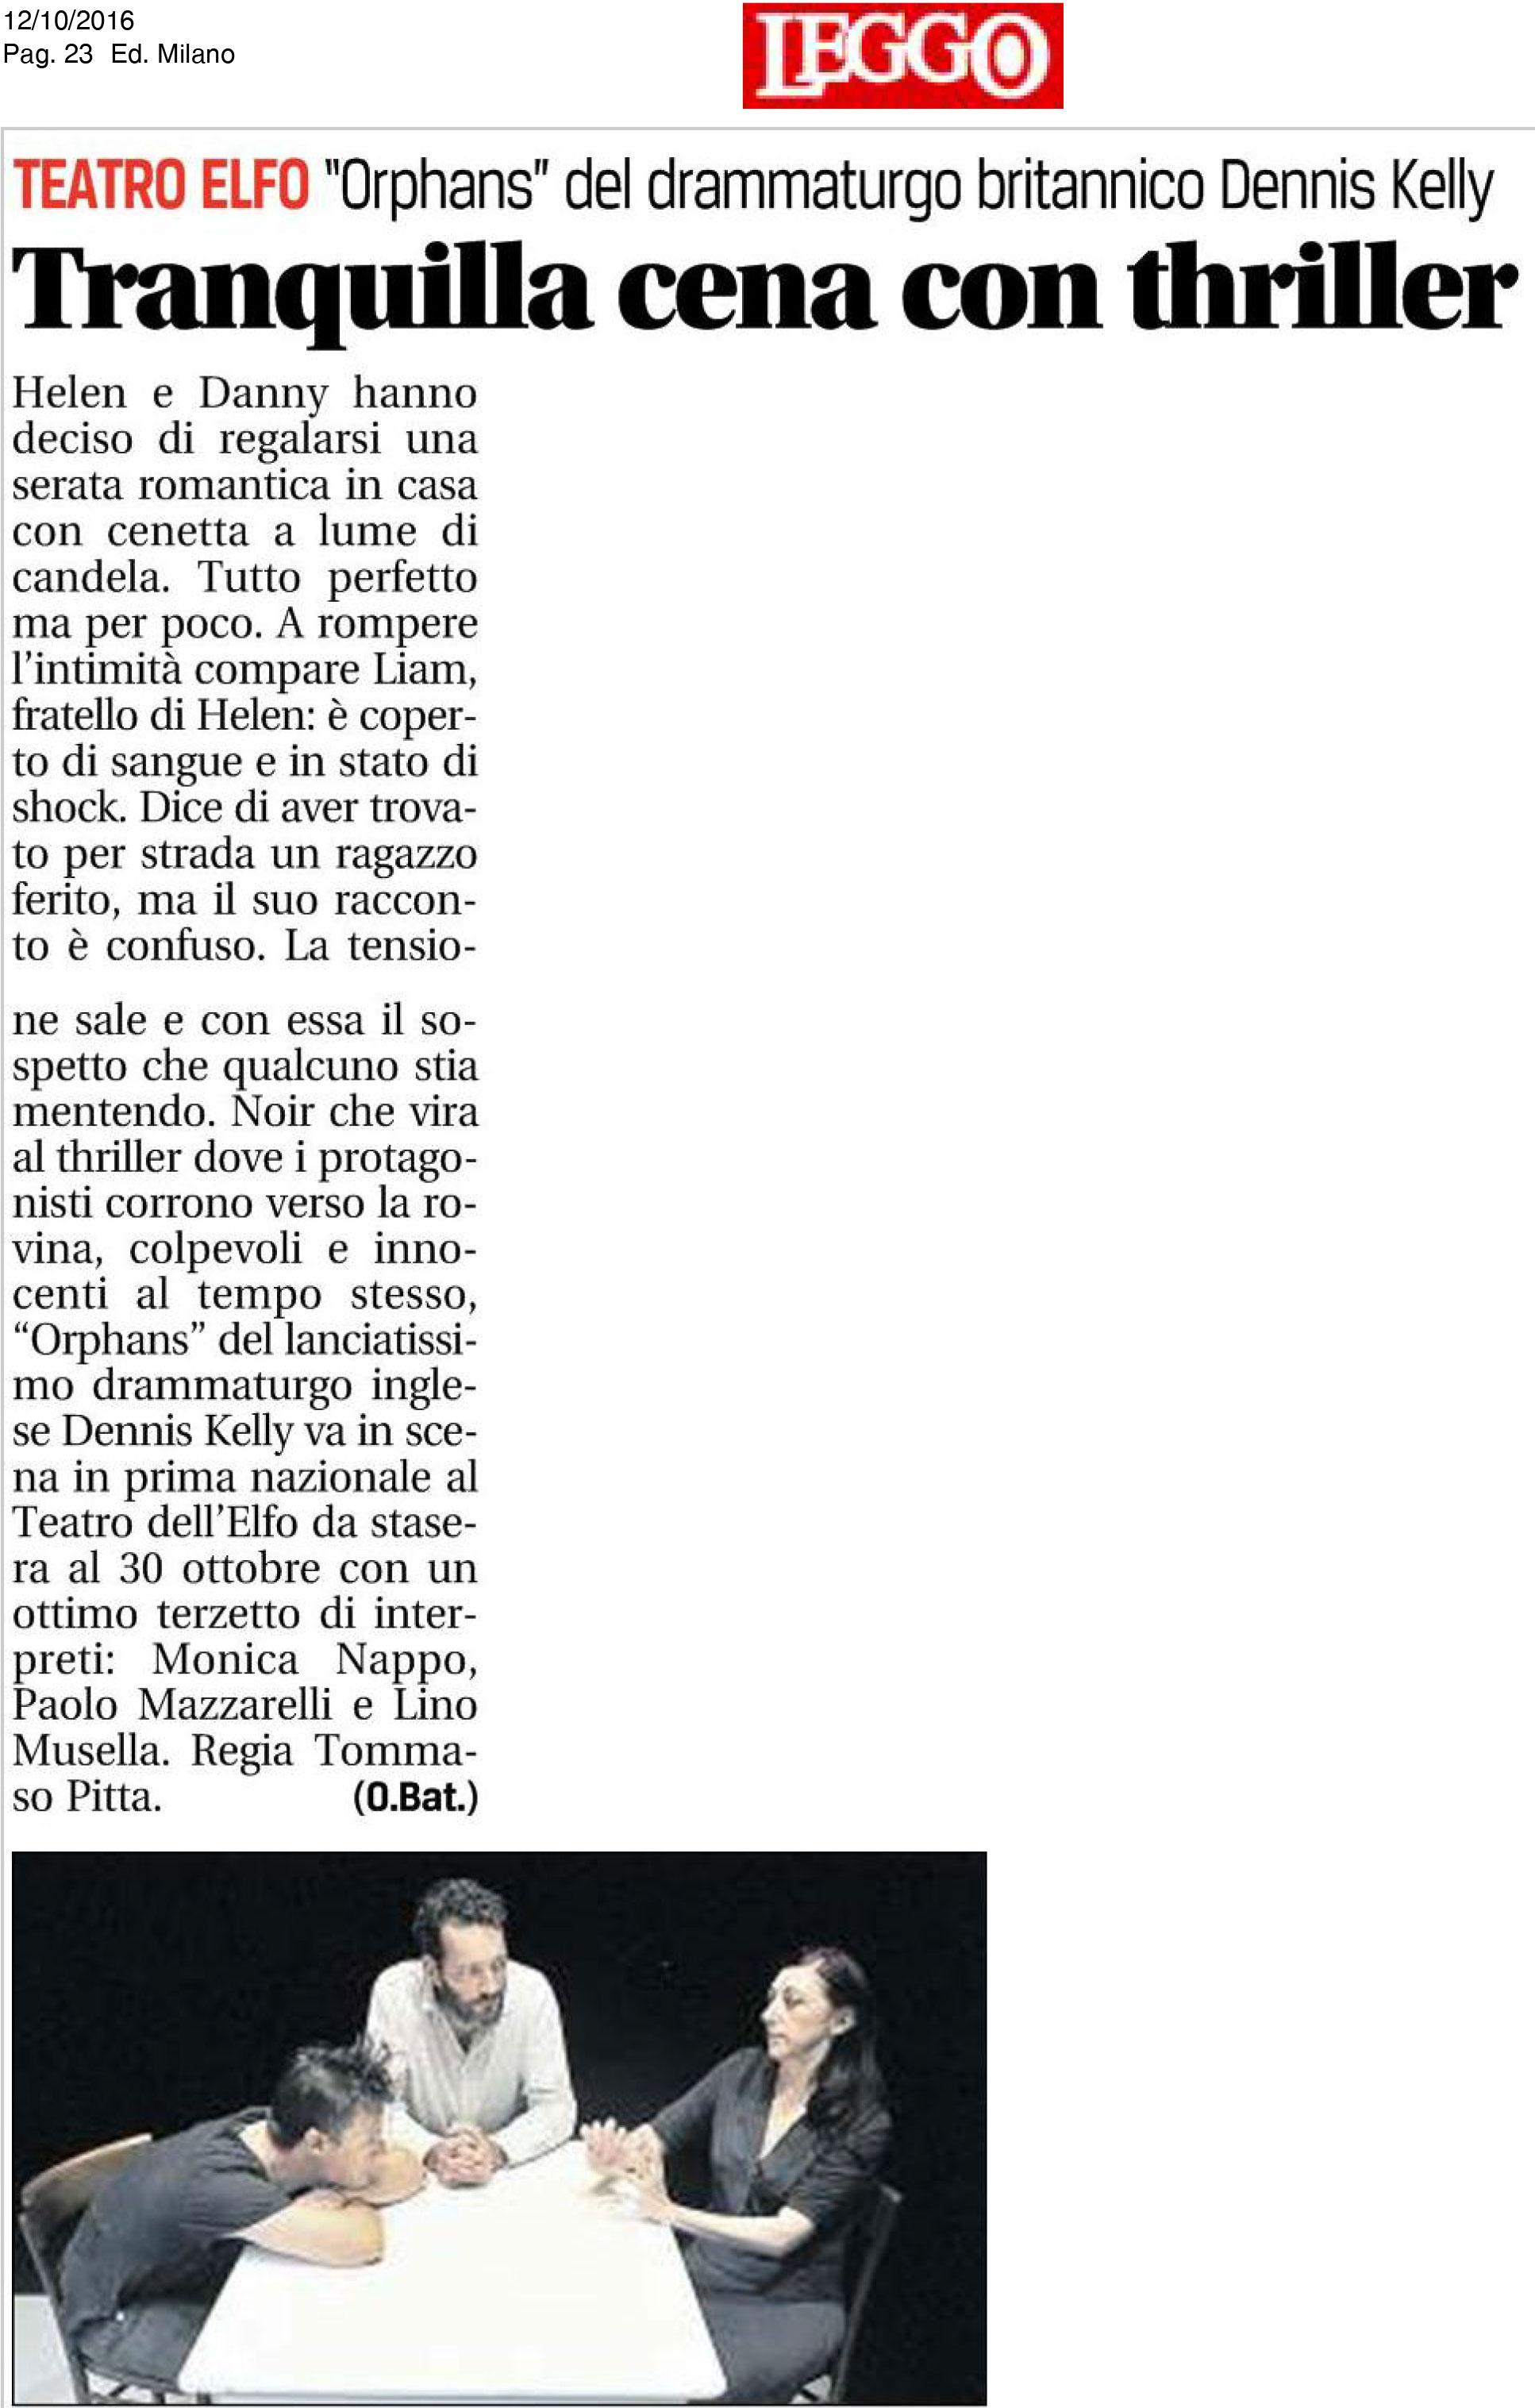 20161012_tranquilla-cena-con-thriller_leggo